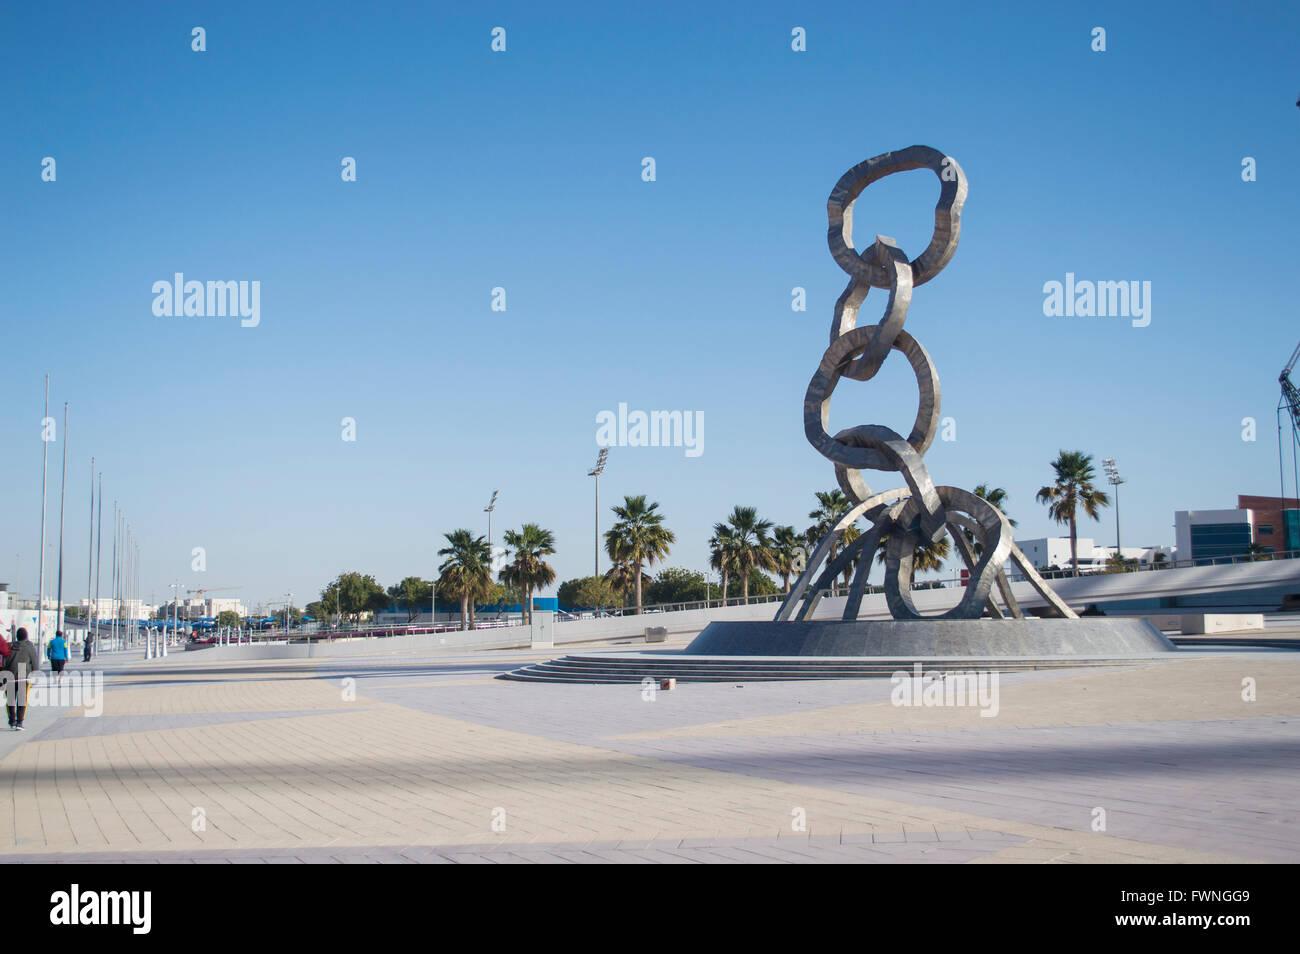 Aspire Academy Qatar Stock Photos & Aspire Academy Qatar Stock Images - Alamy